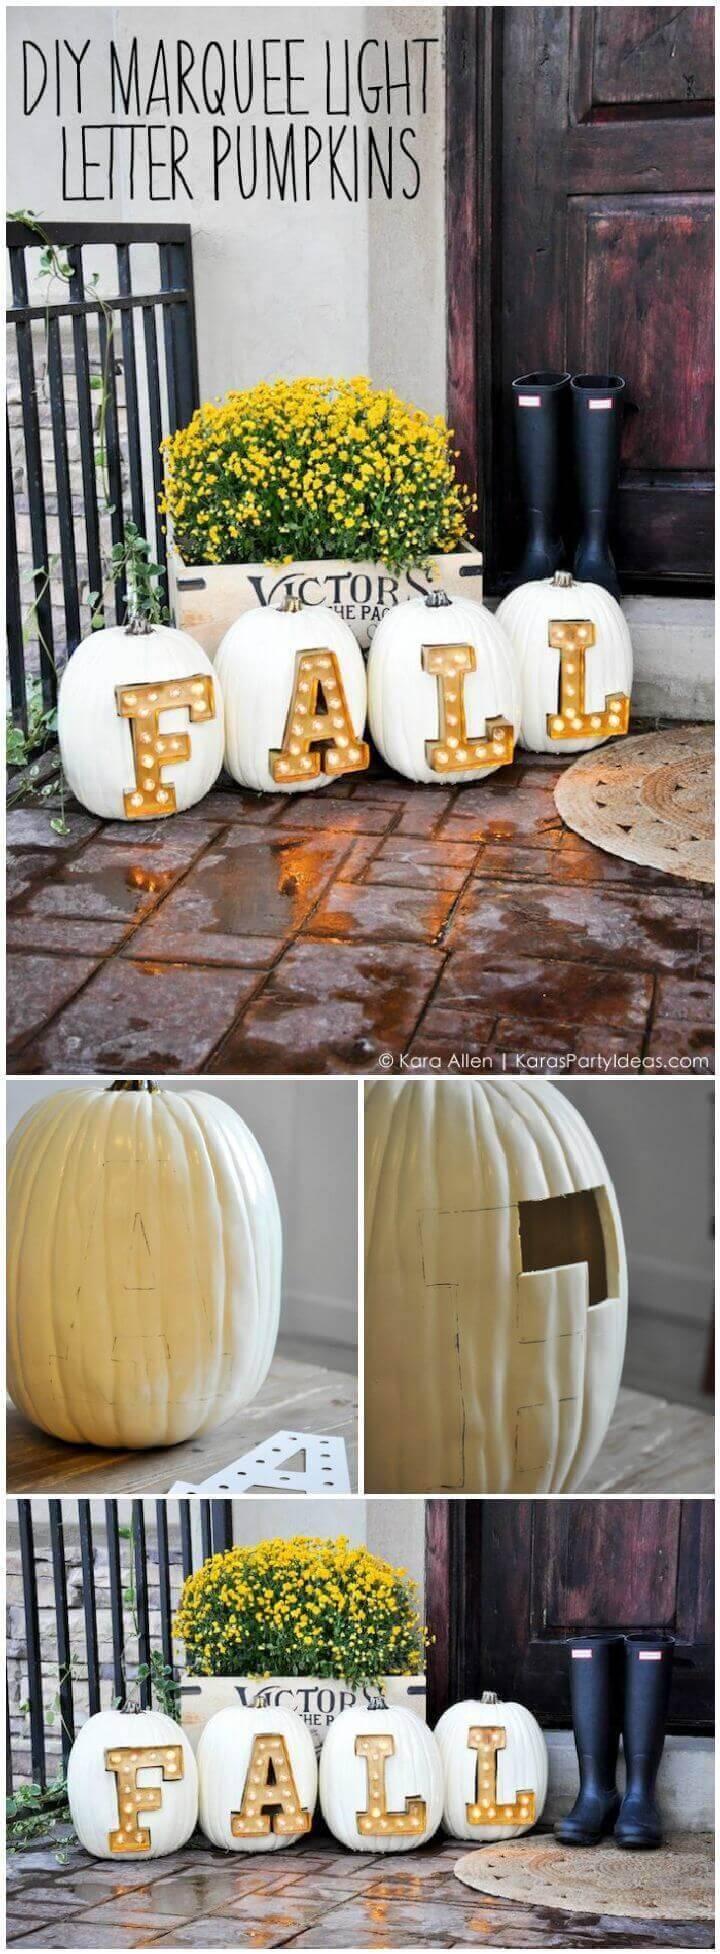 DIY Marquee Light Letter Pumpkins